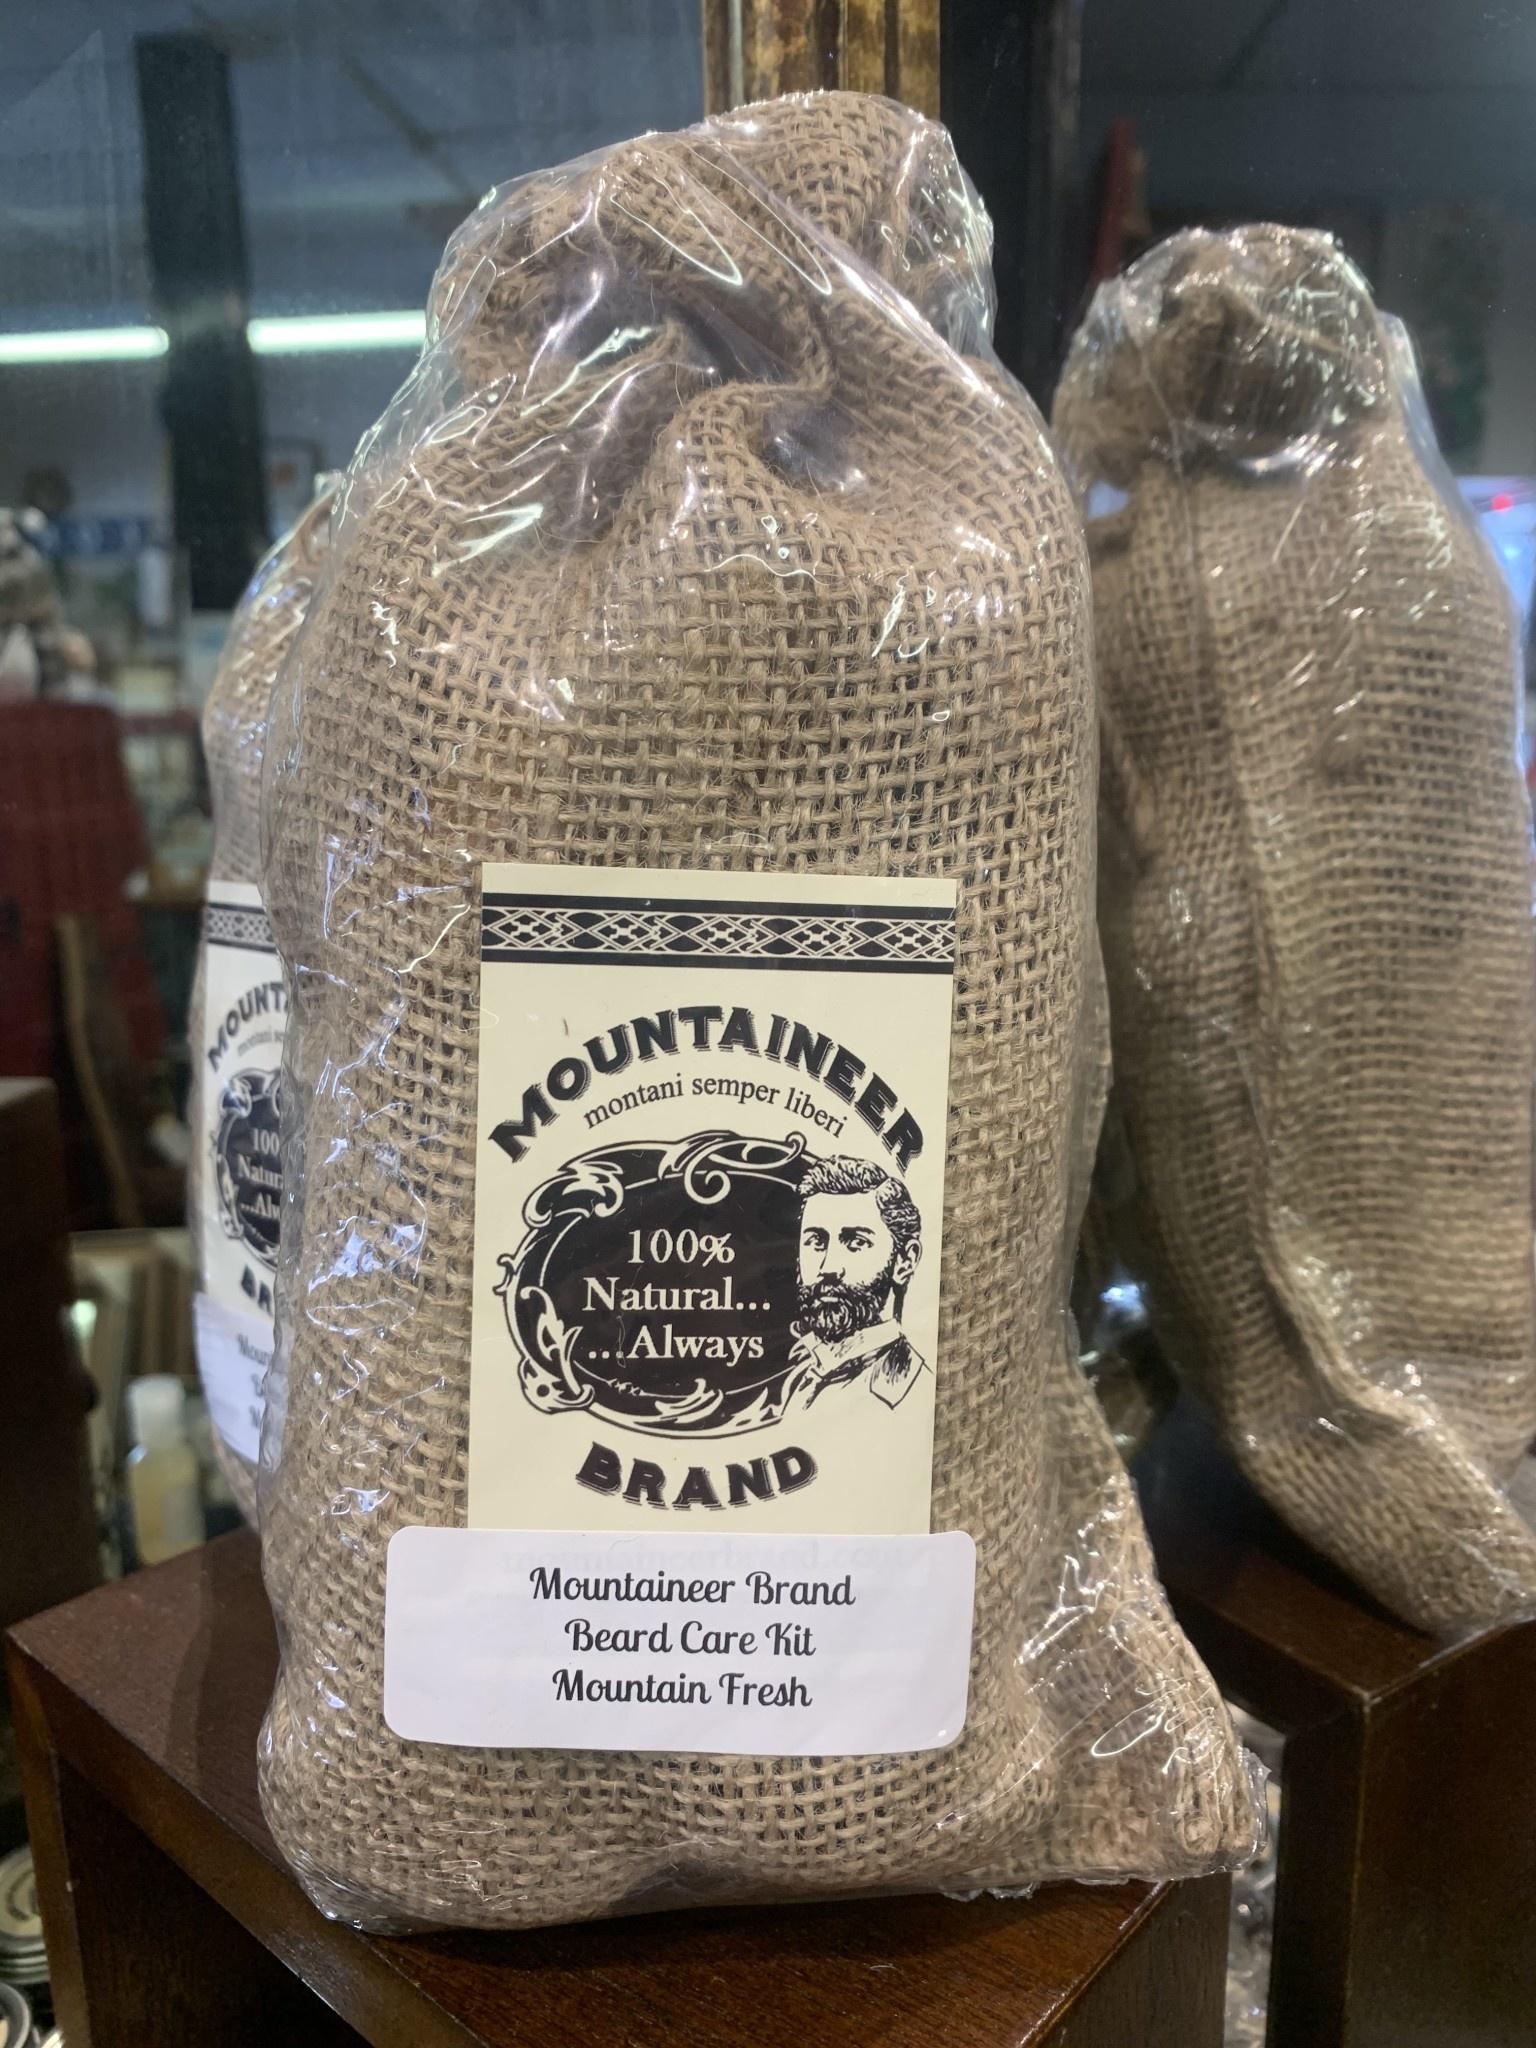 Mountaineer Brand Beard Kit Mt. Fresh